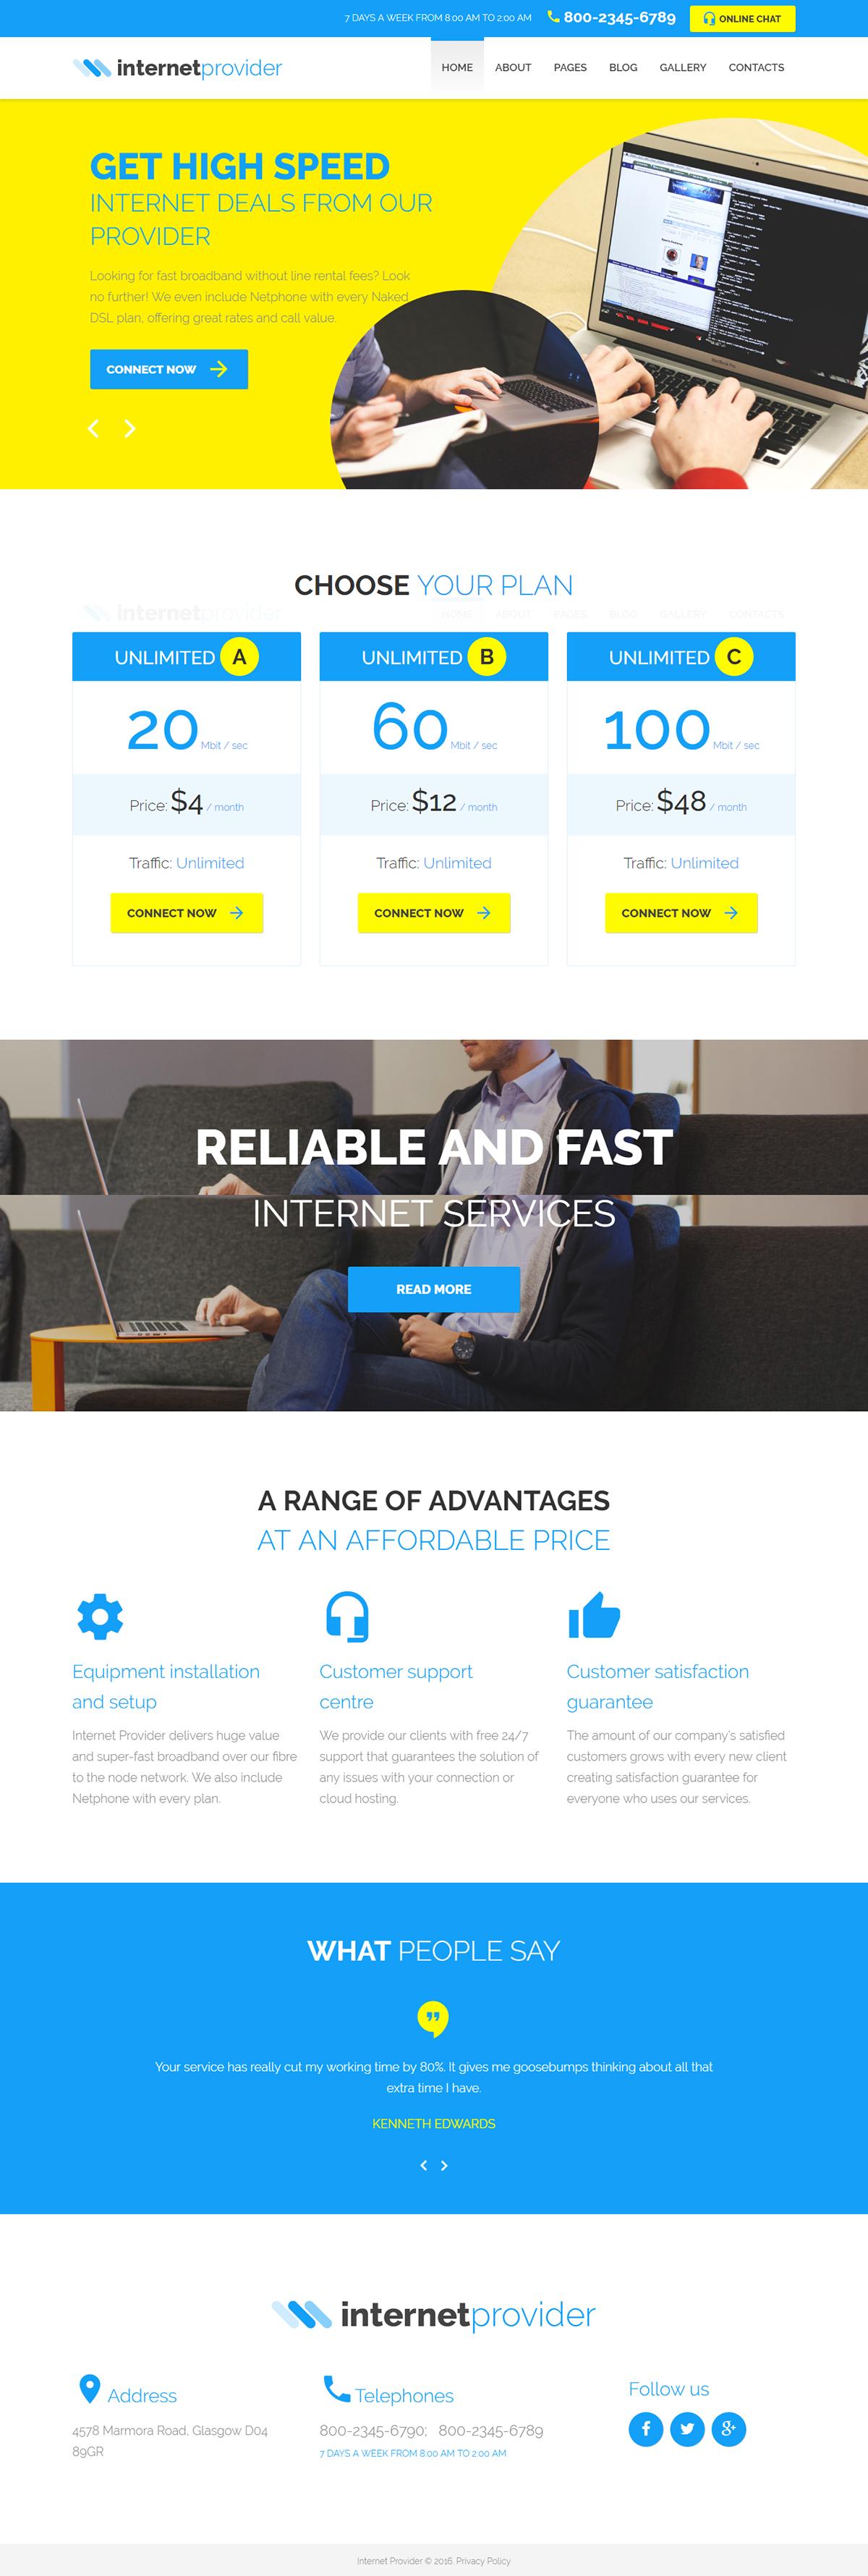 Internet Provider Joomla Template on Behance